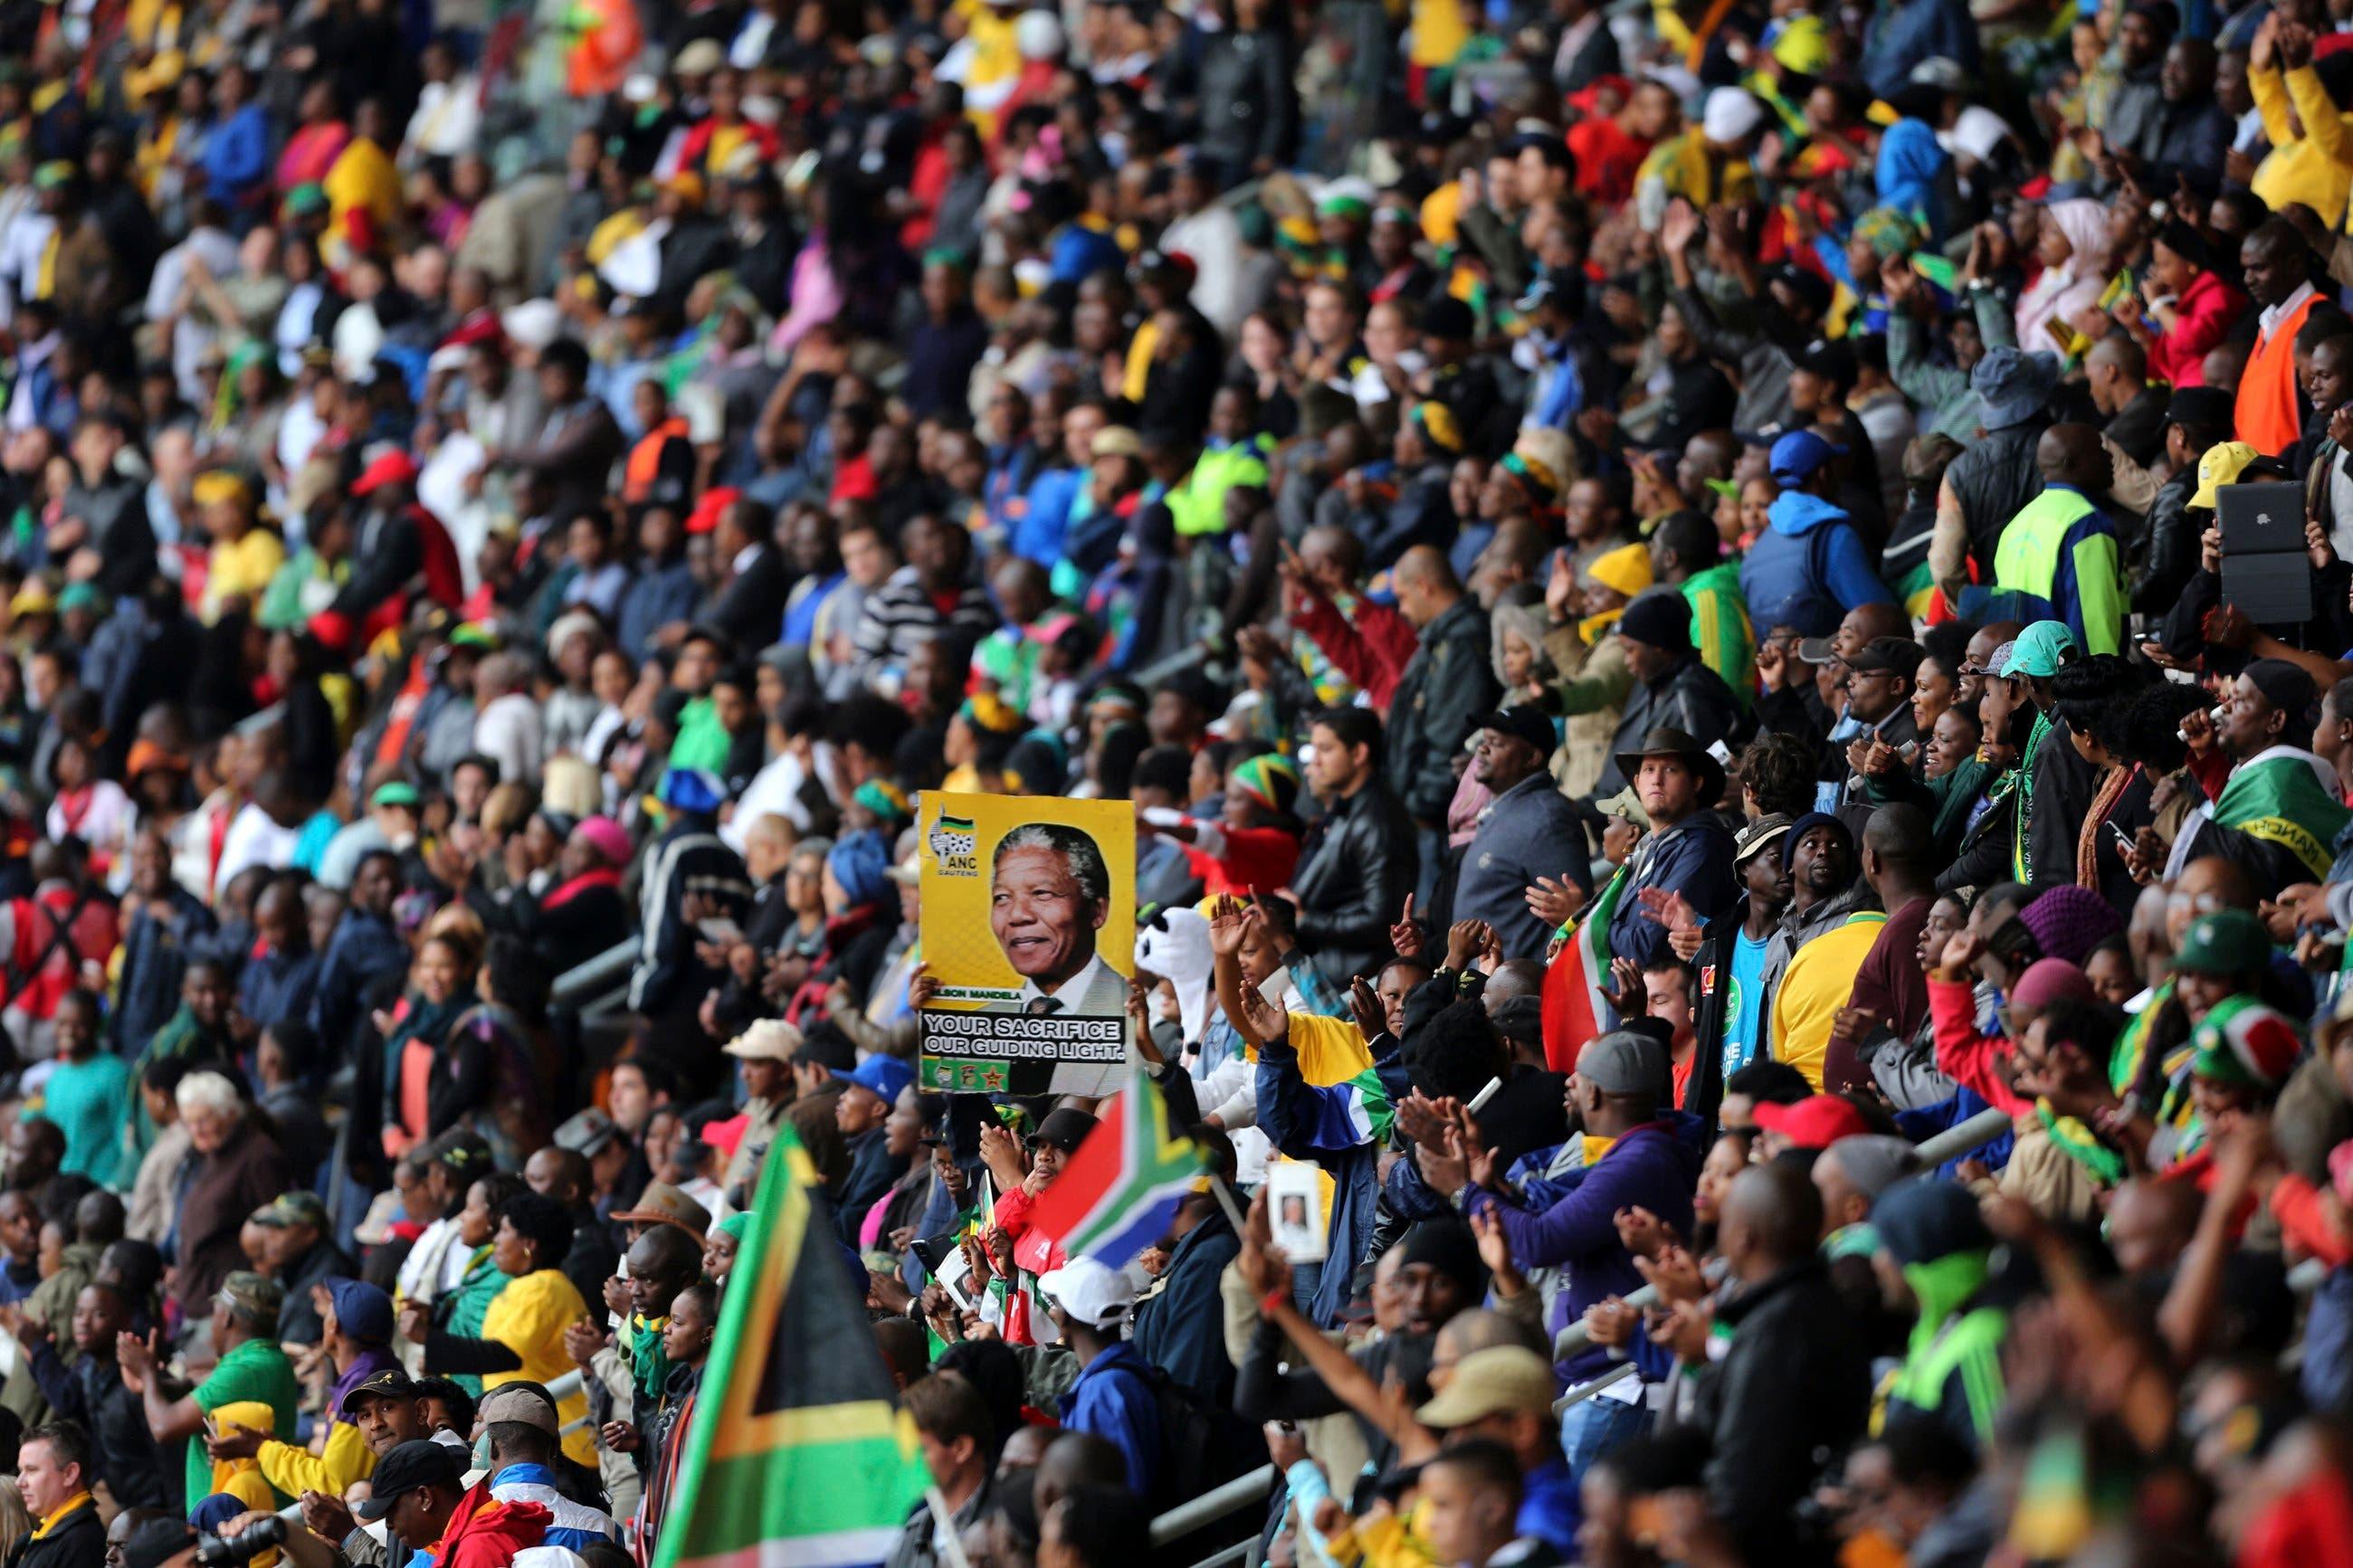 Mandela's memorial brings world leaders together